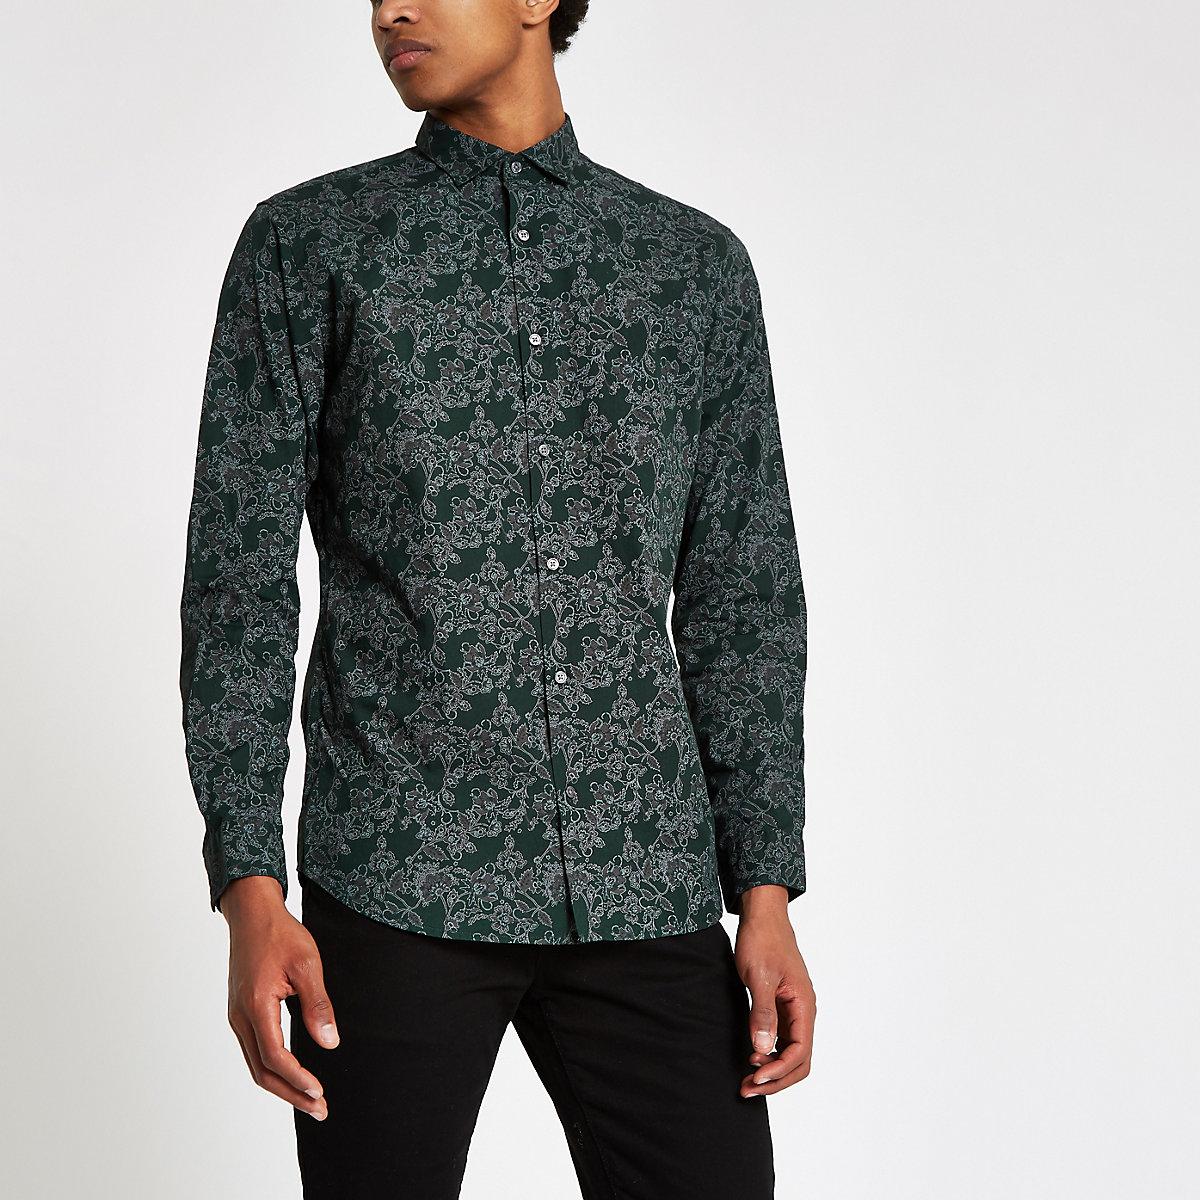 Jack & Jones green slim fit floral shirt